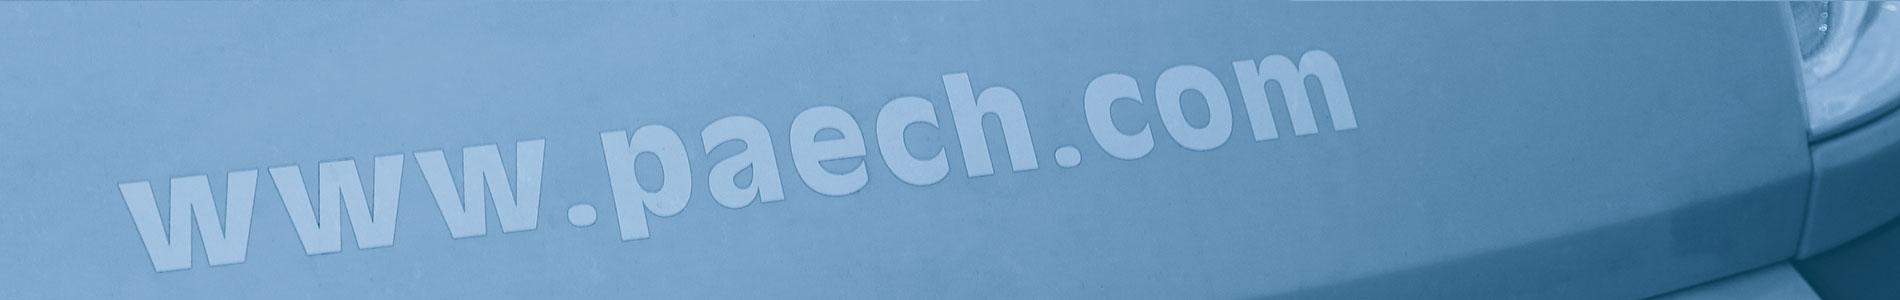 Ute Paech GmbH & Co. KG - Bundeswehrumzüge